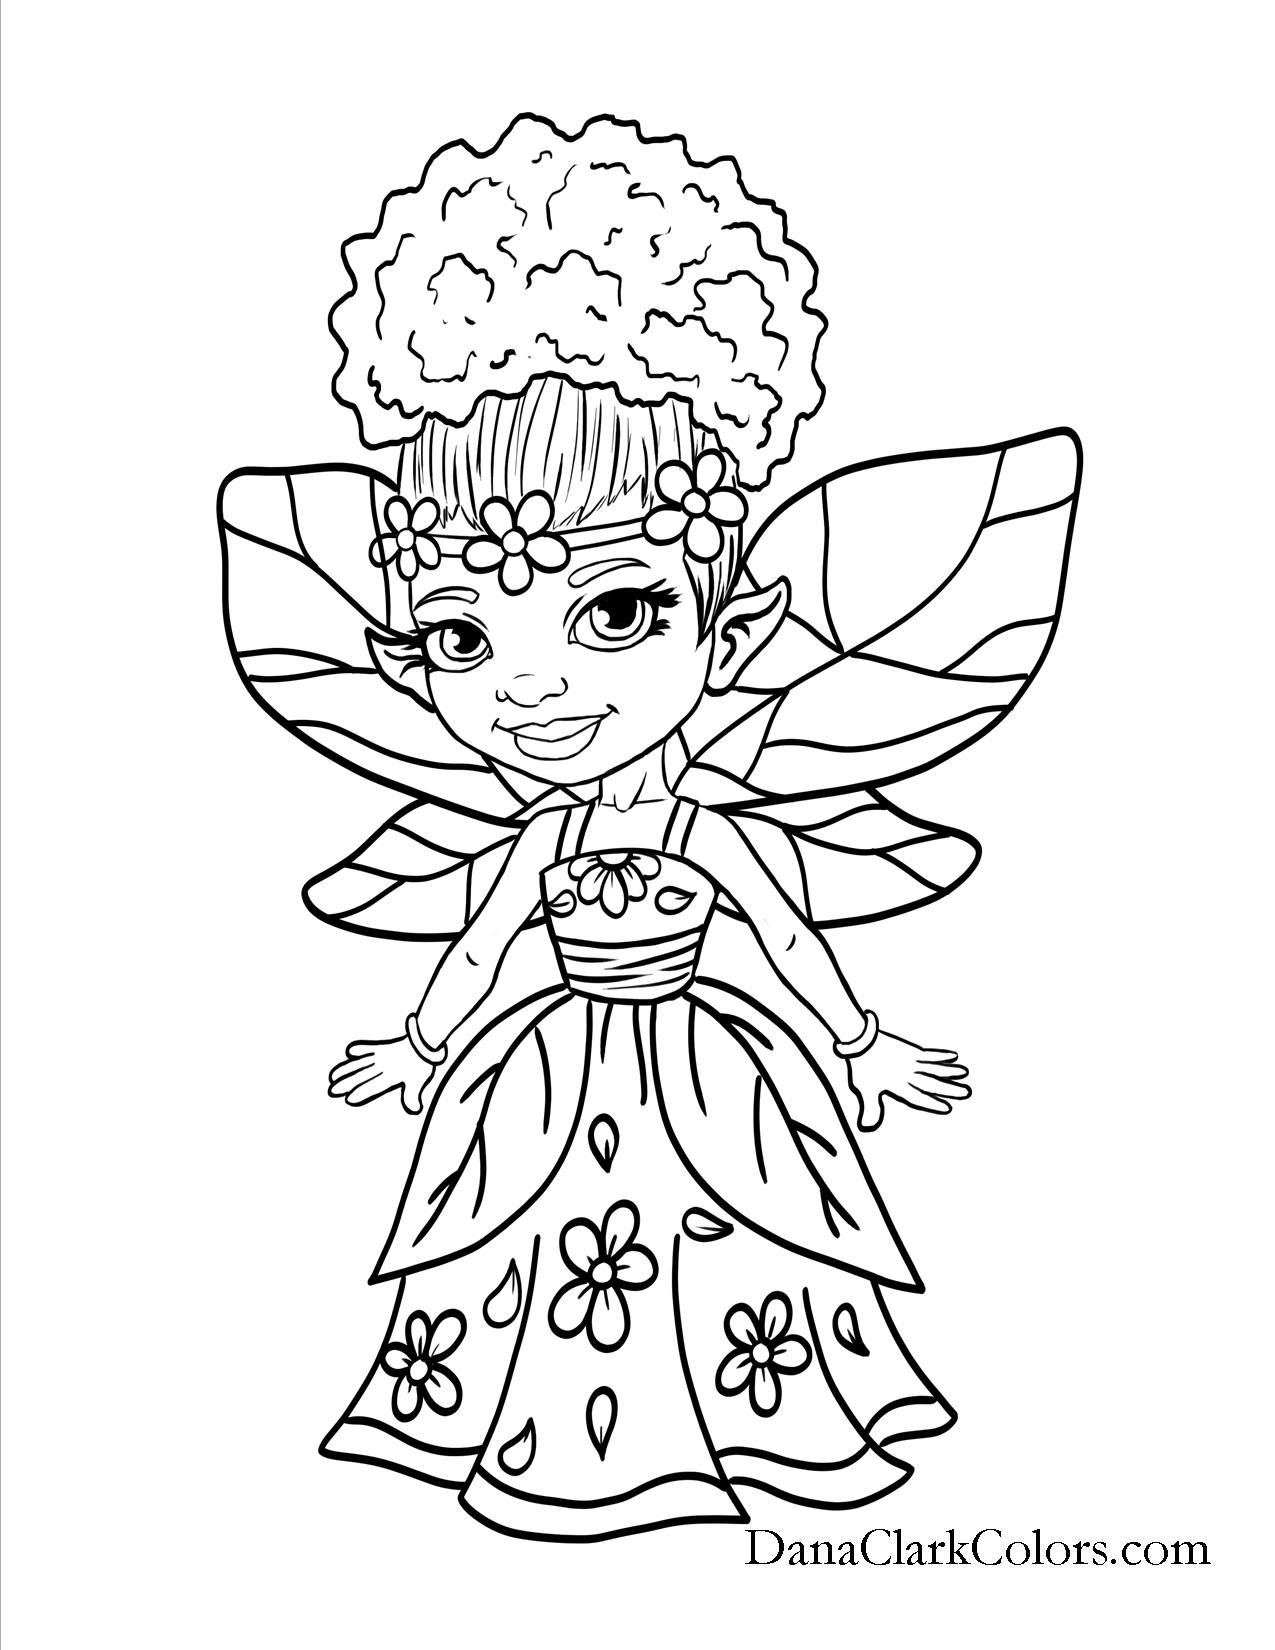 Free Coloring Pages Danaclarkcolors Com Fairy Coloring Pages Free Coloring Pages Angel Coloring Pages